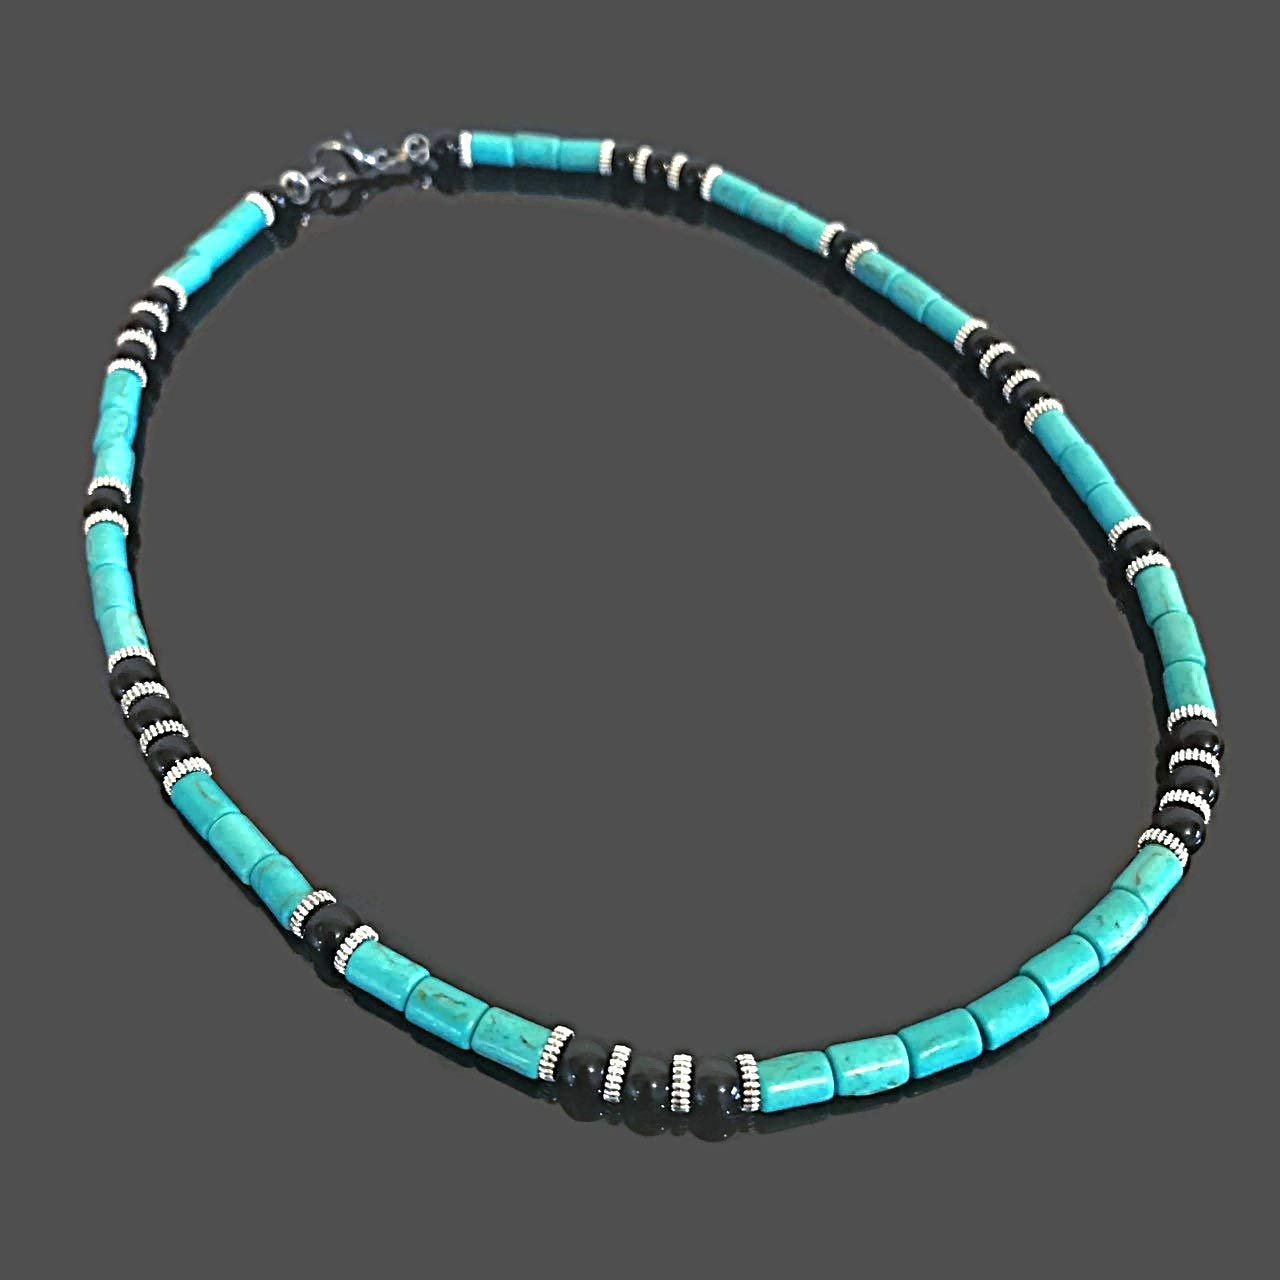 Mens Beaded Necklace Men Surfer Necklace Mens Black Onyx Necklace Choker Beach Necklace Men Silver Hematite African Necklace